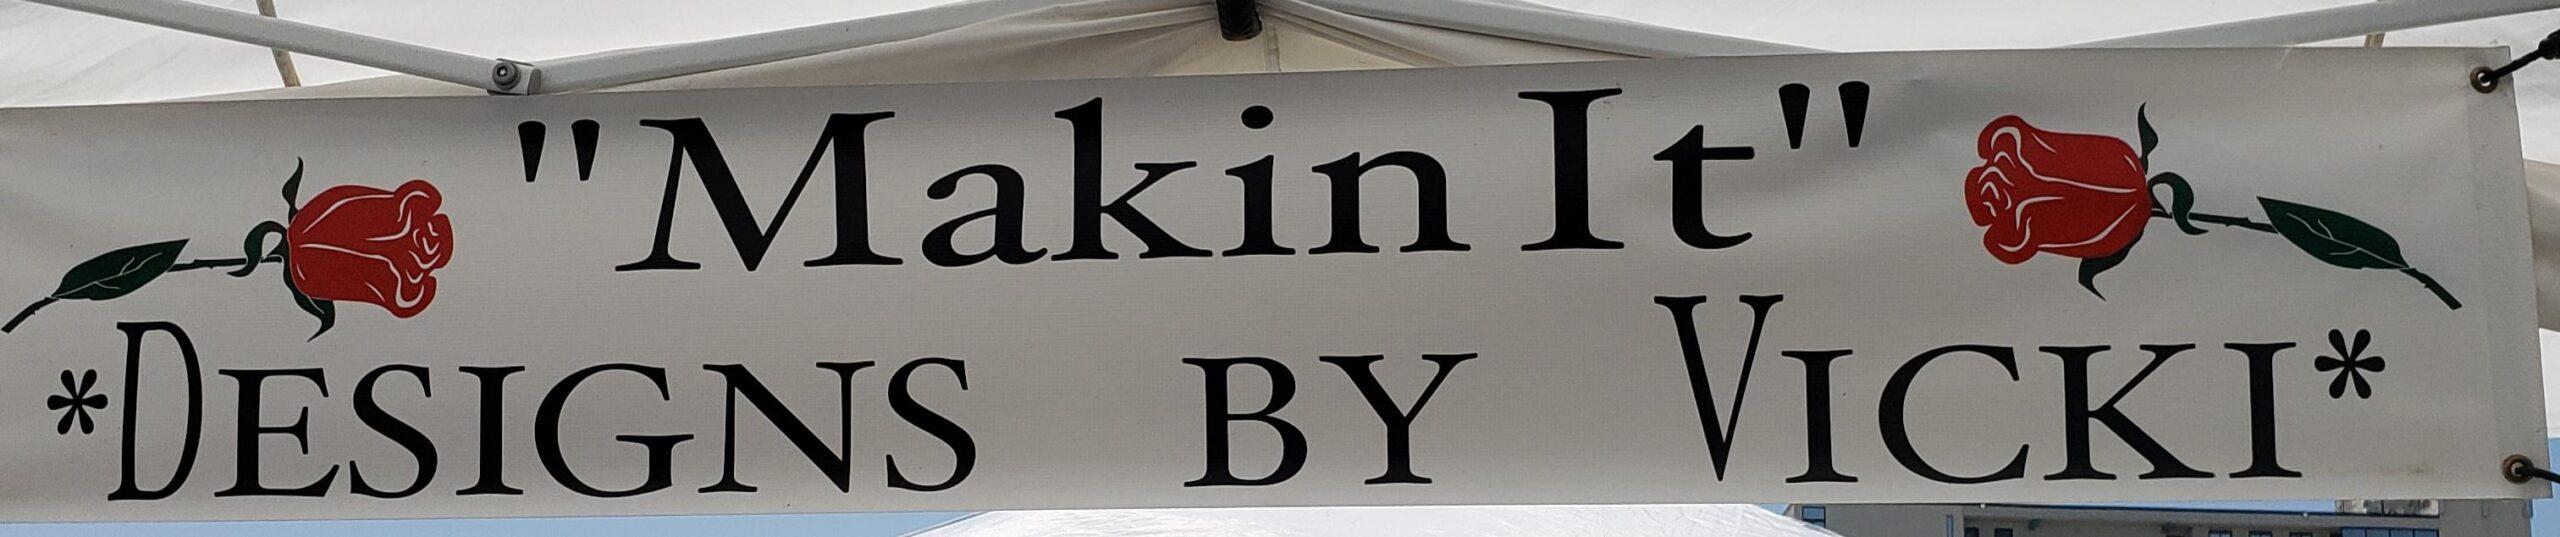 Makinit Designs By Vicki – V61